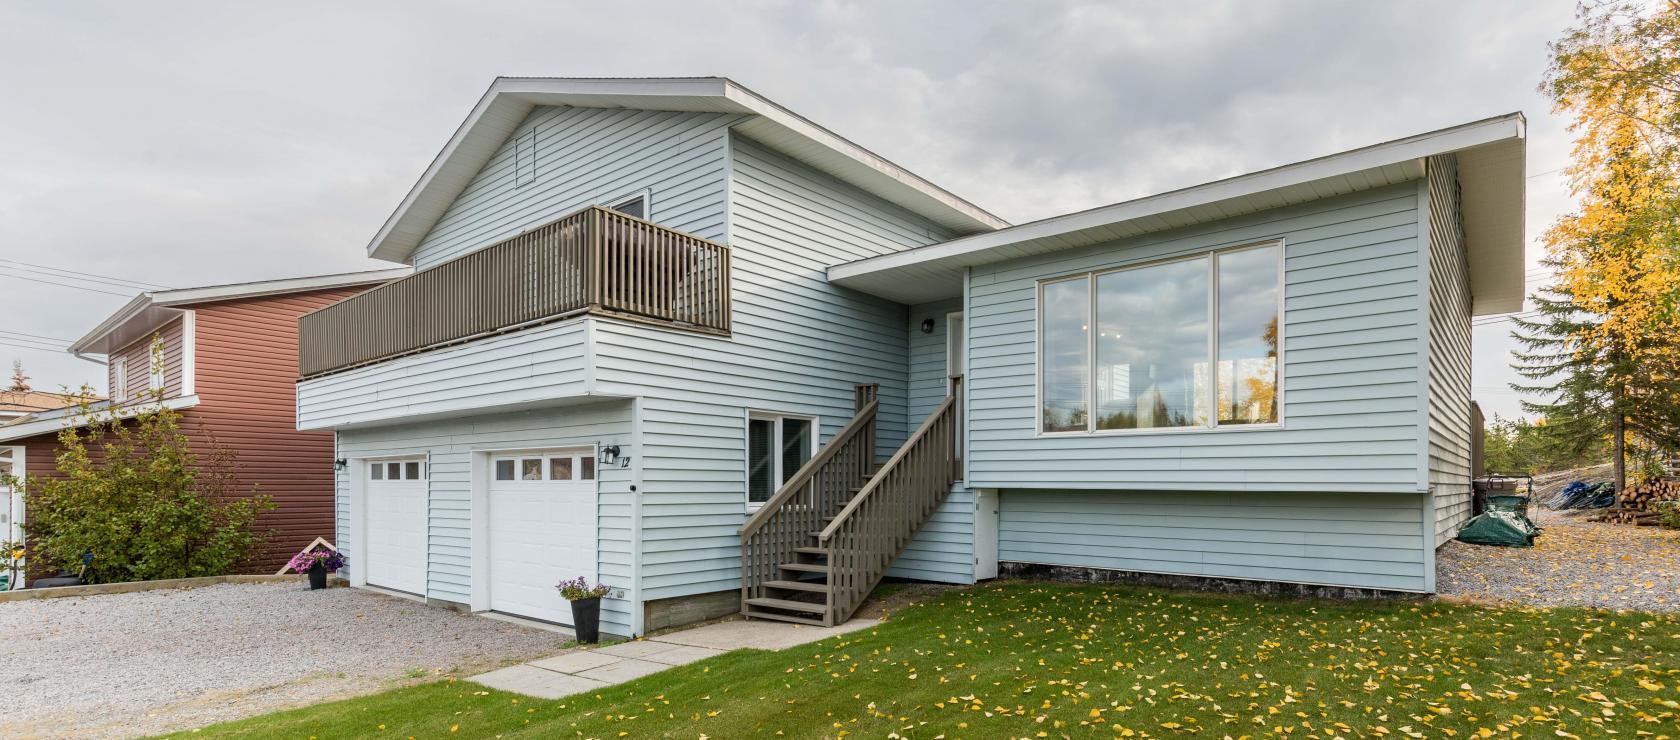 12 Braathen Avenue, Frame Lake South, Yellowknife 2